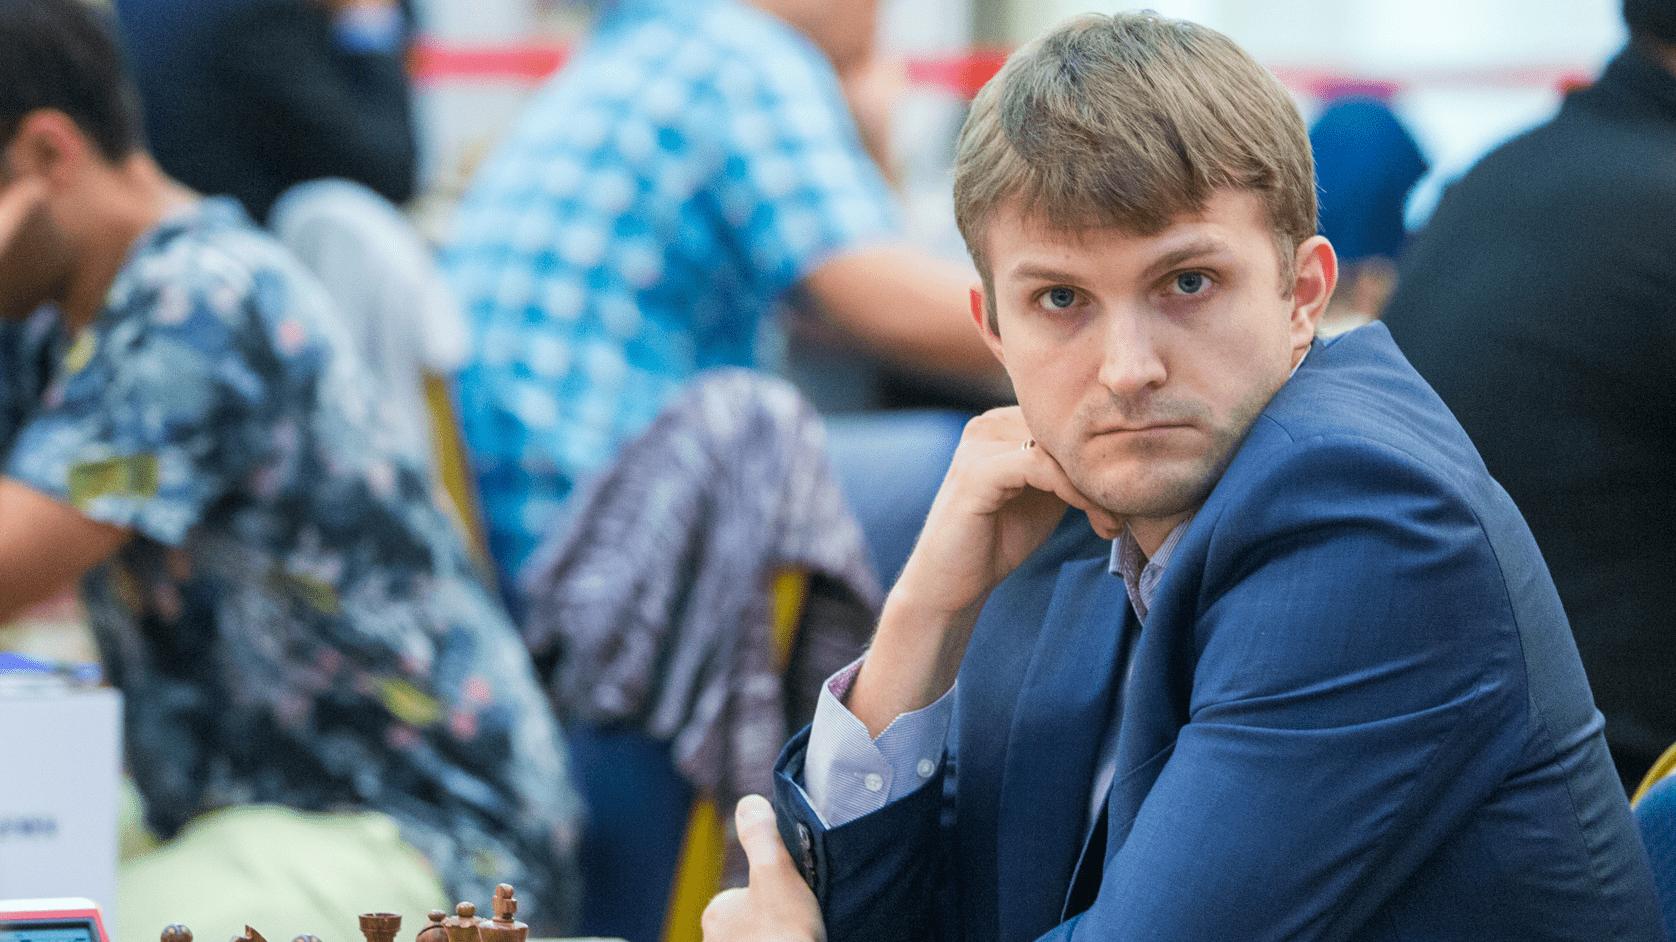 Russian Championship Superfinal R6: Vitiugov In The Lead